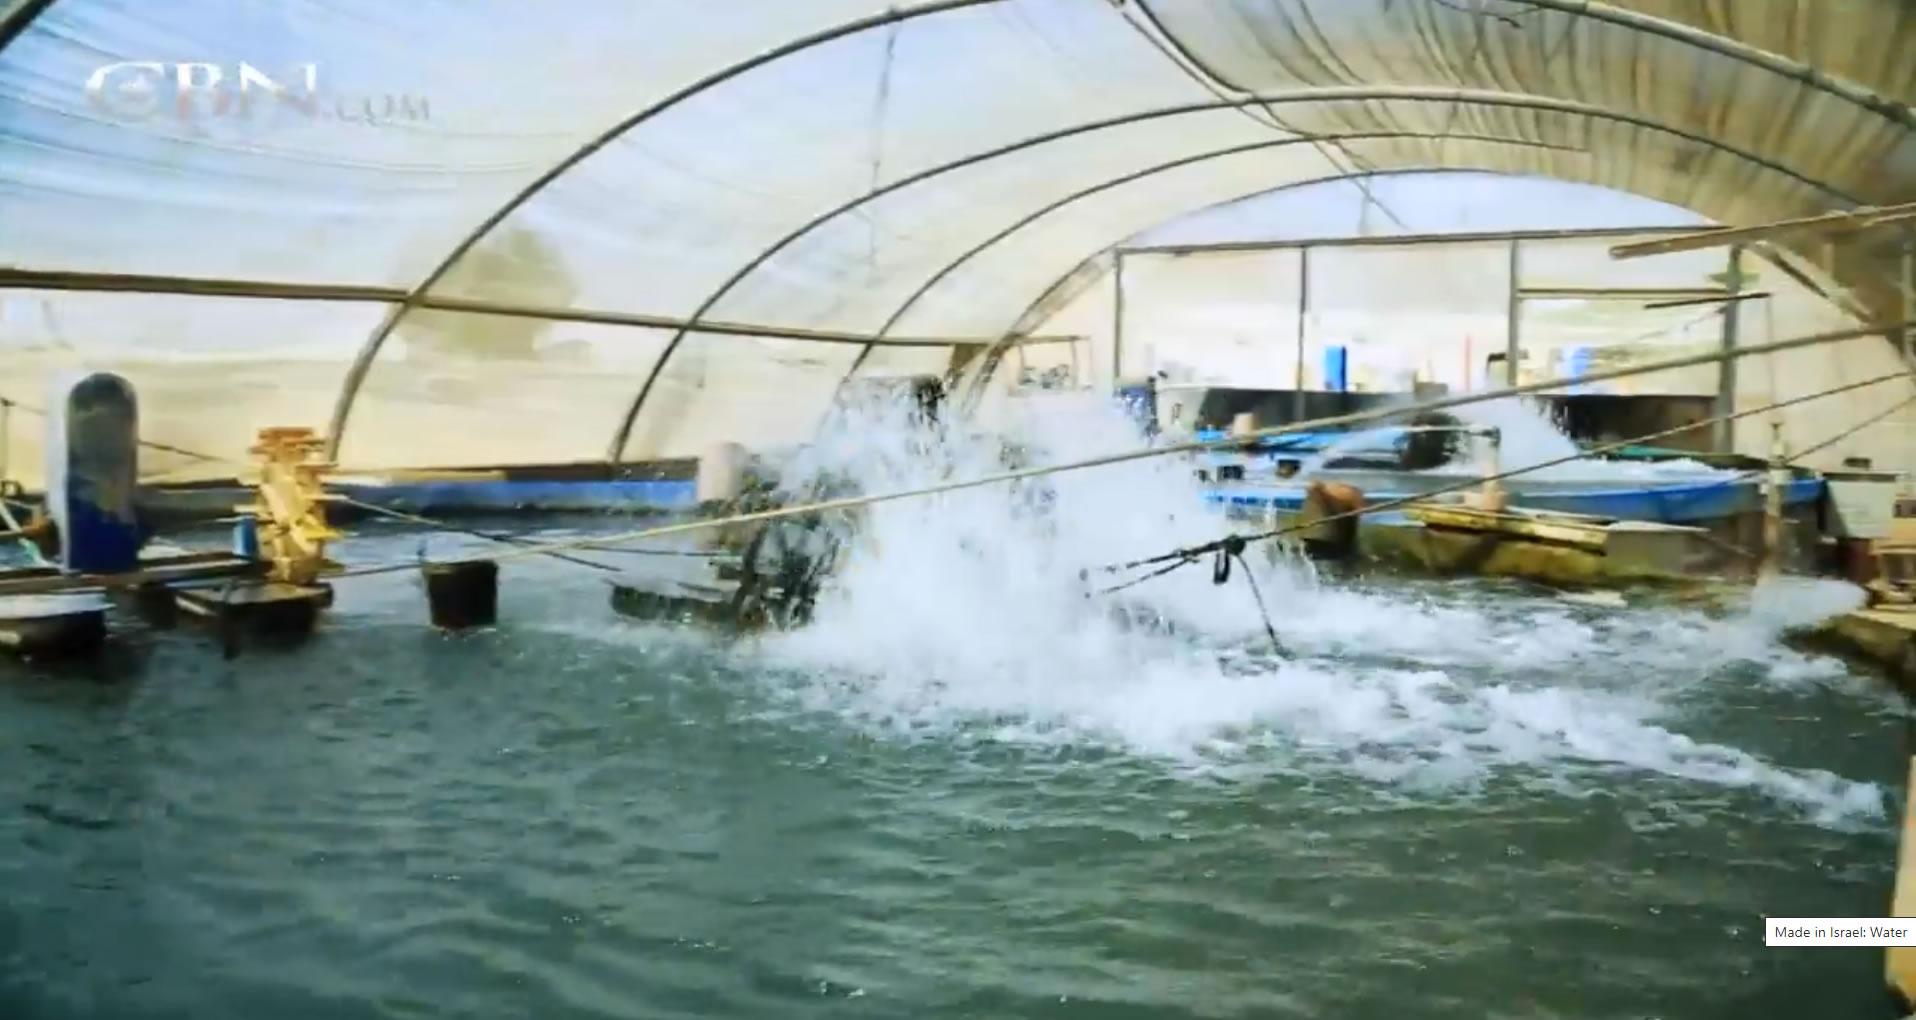 Fish Pools in The Desert